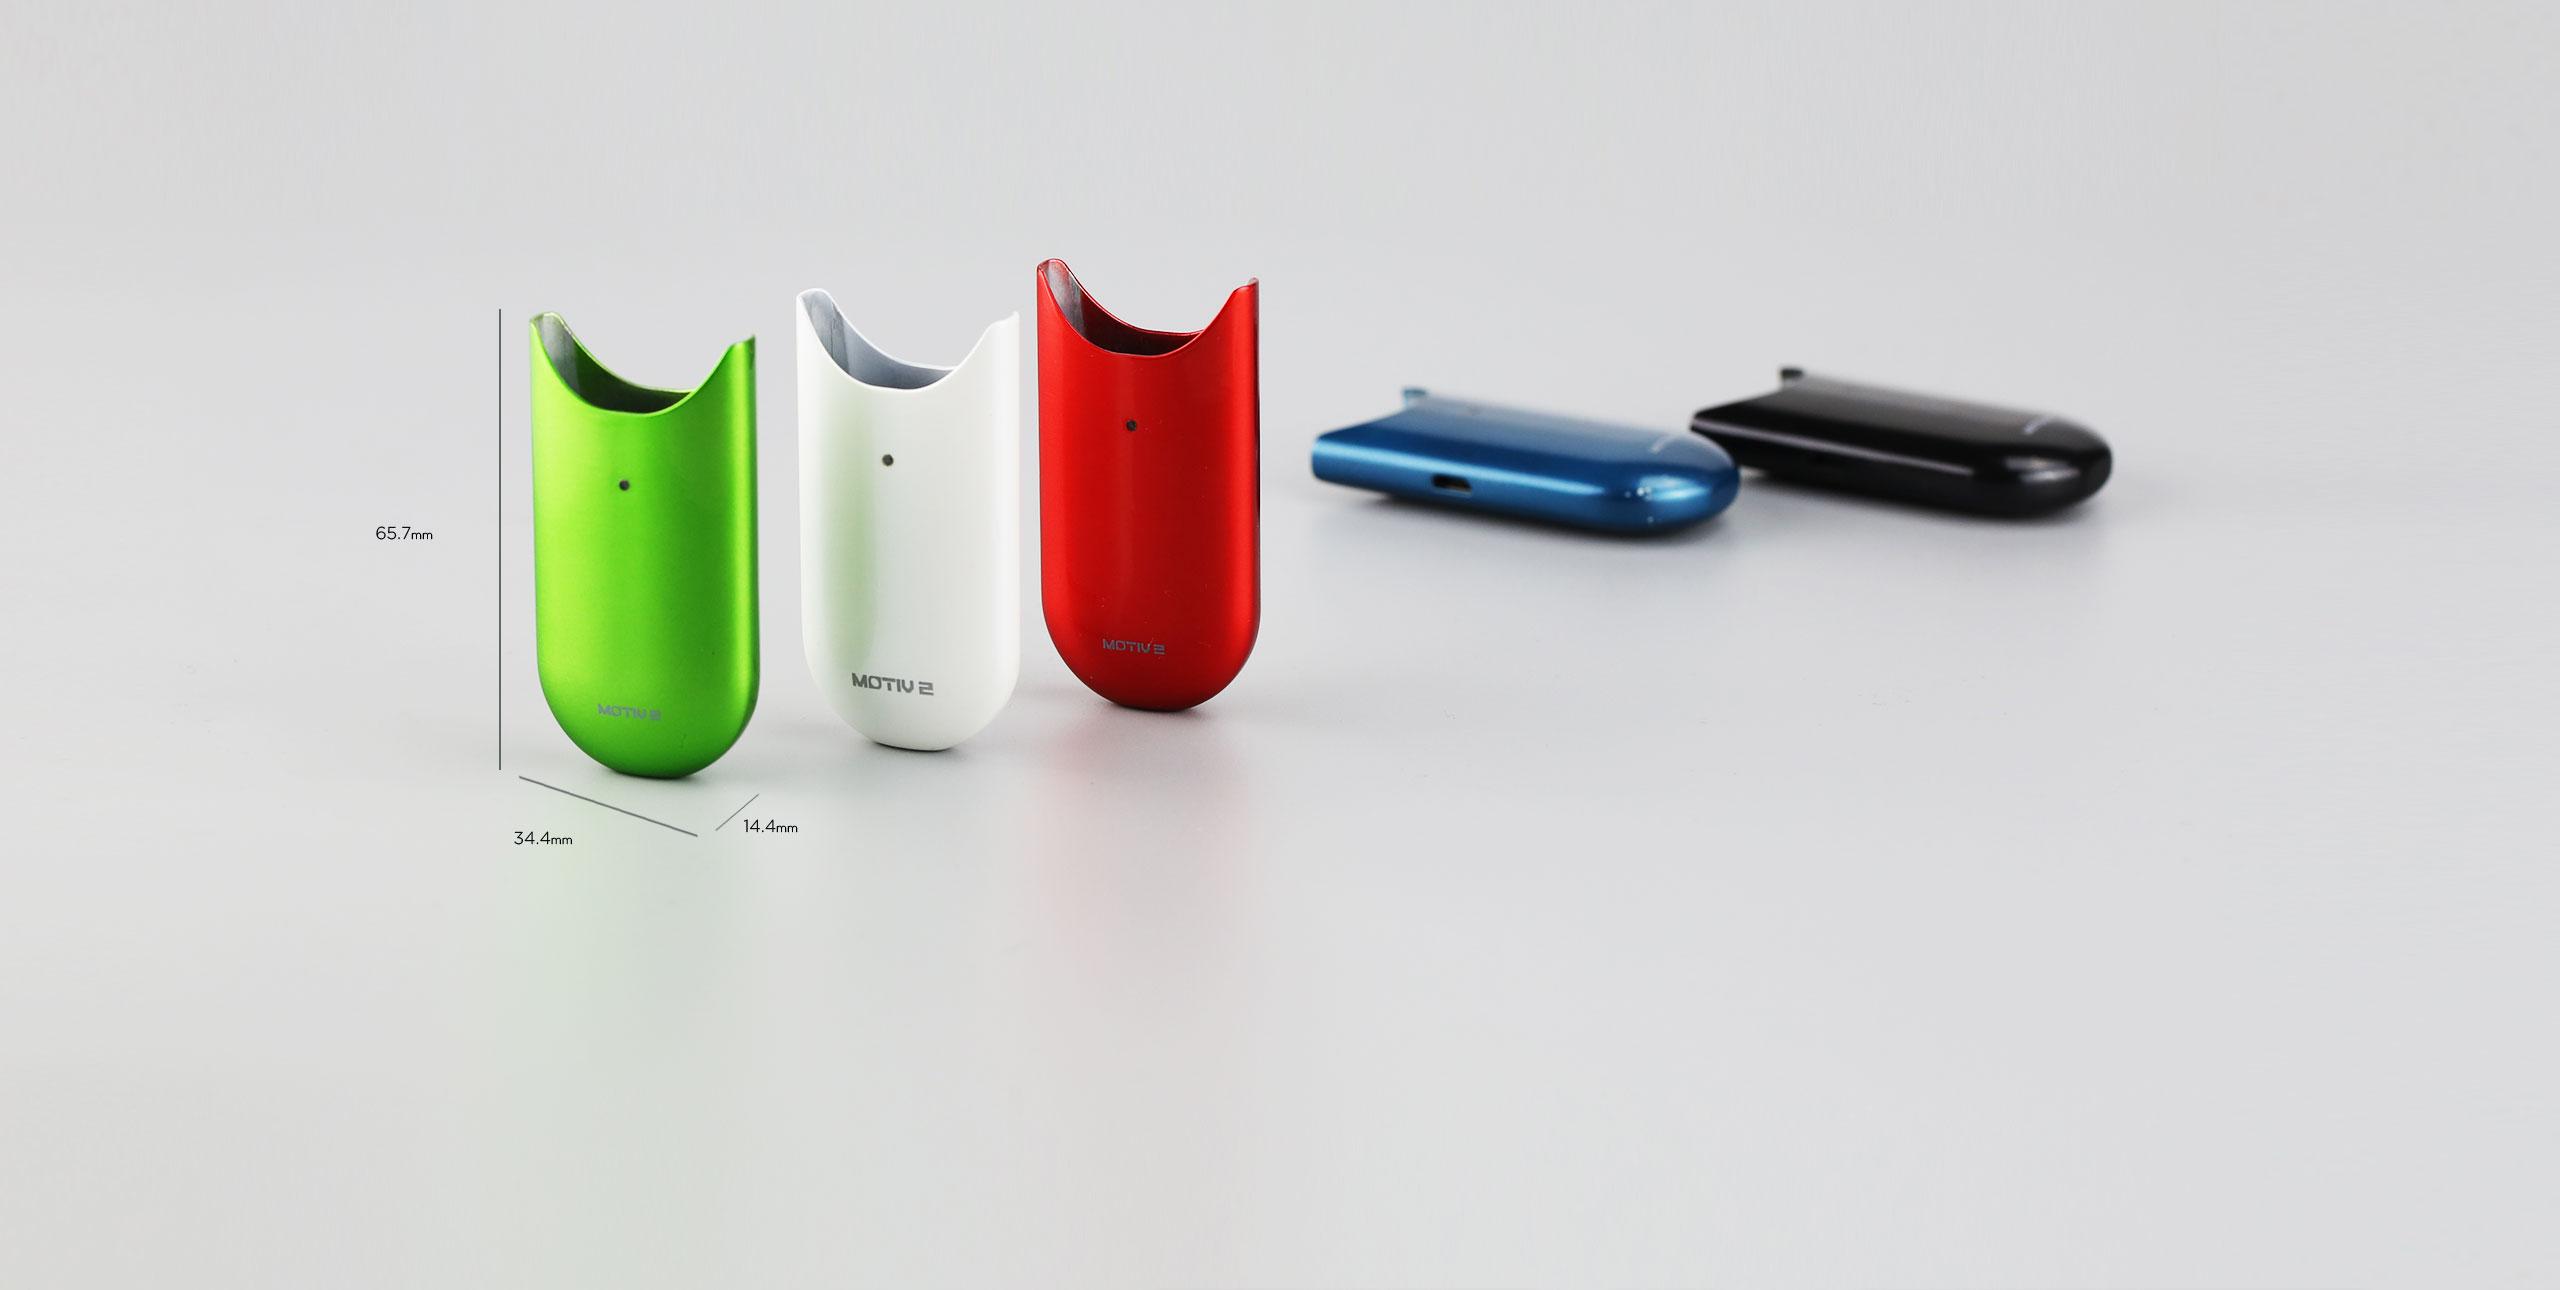 MOTIV 2 Battery